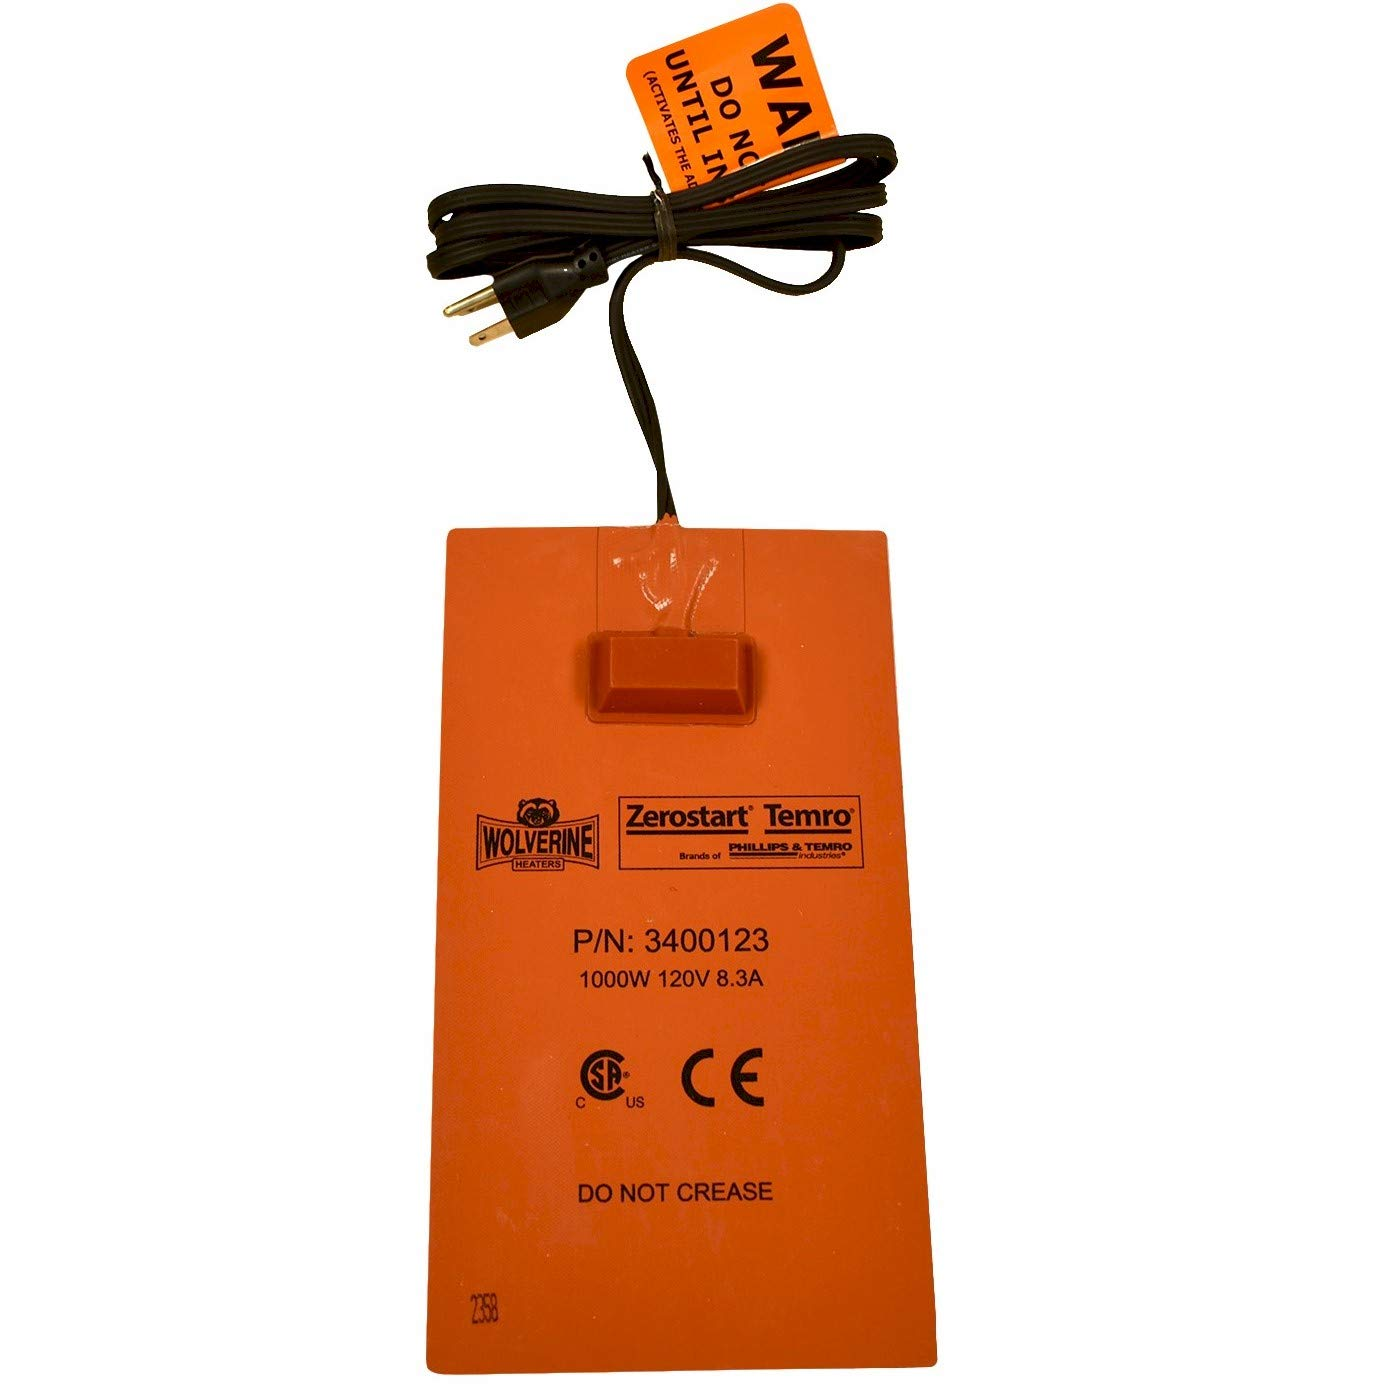 Hatco 02.08.570.01 1050 Watt 120 Volt Coil Element Fshc-6W1